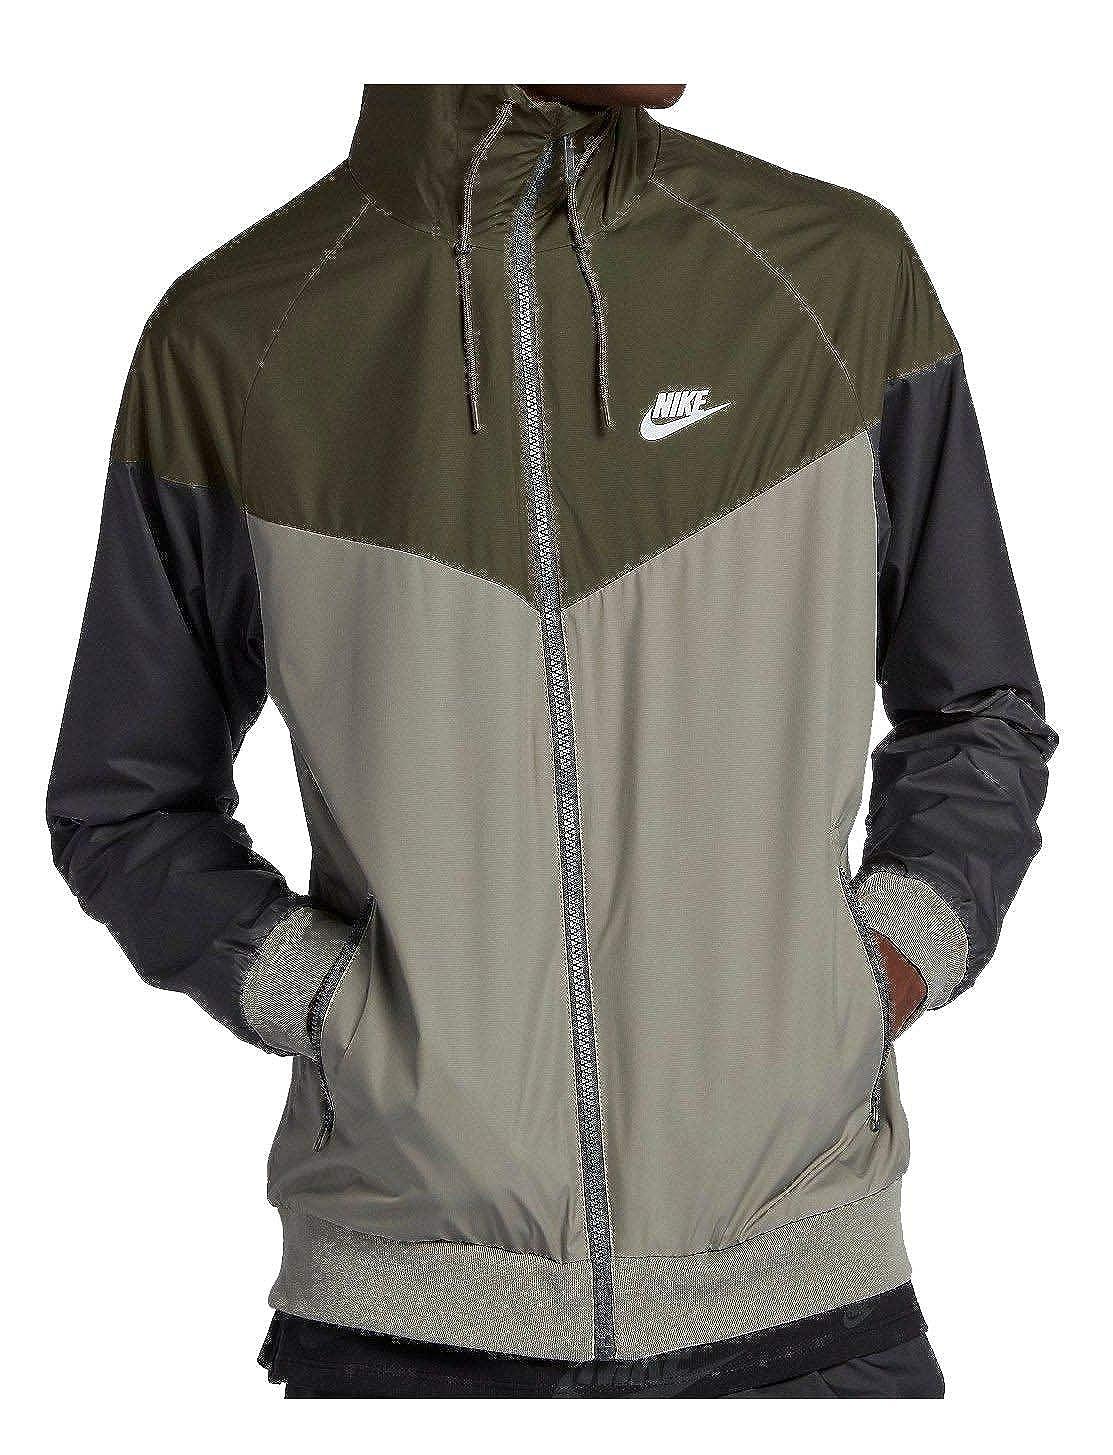 727324-395 Nike Windrunner Jacket Olive Green Stucco Black M-4XL